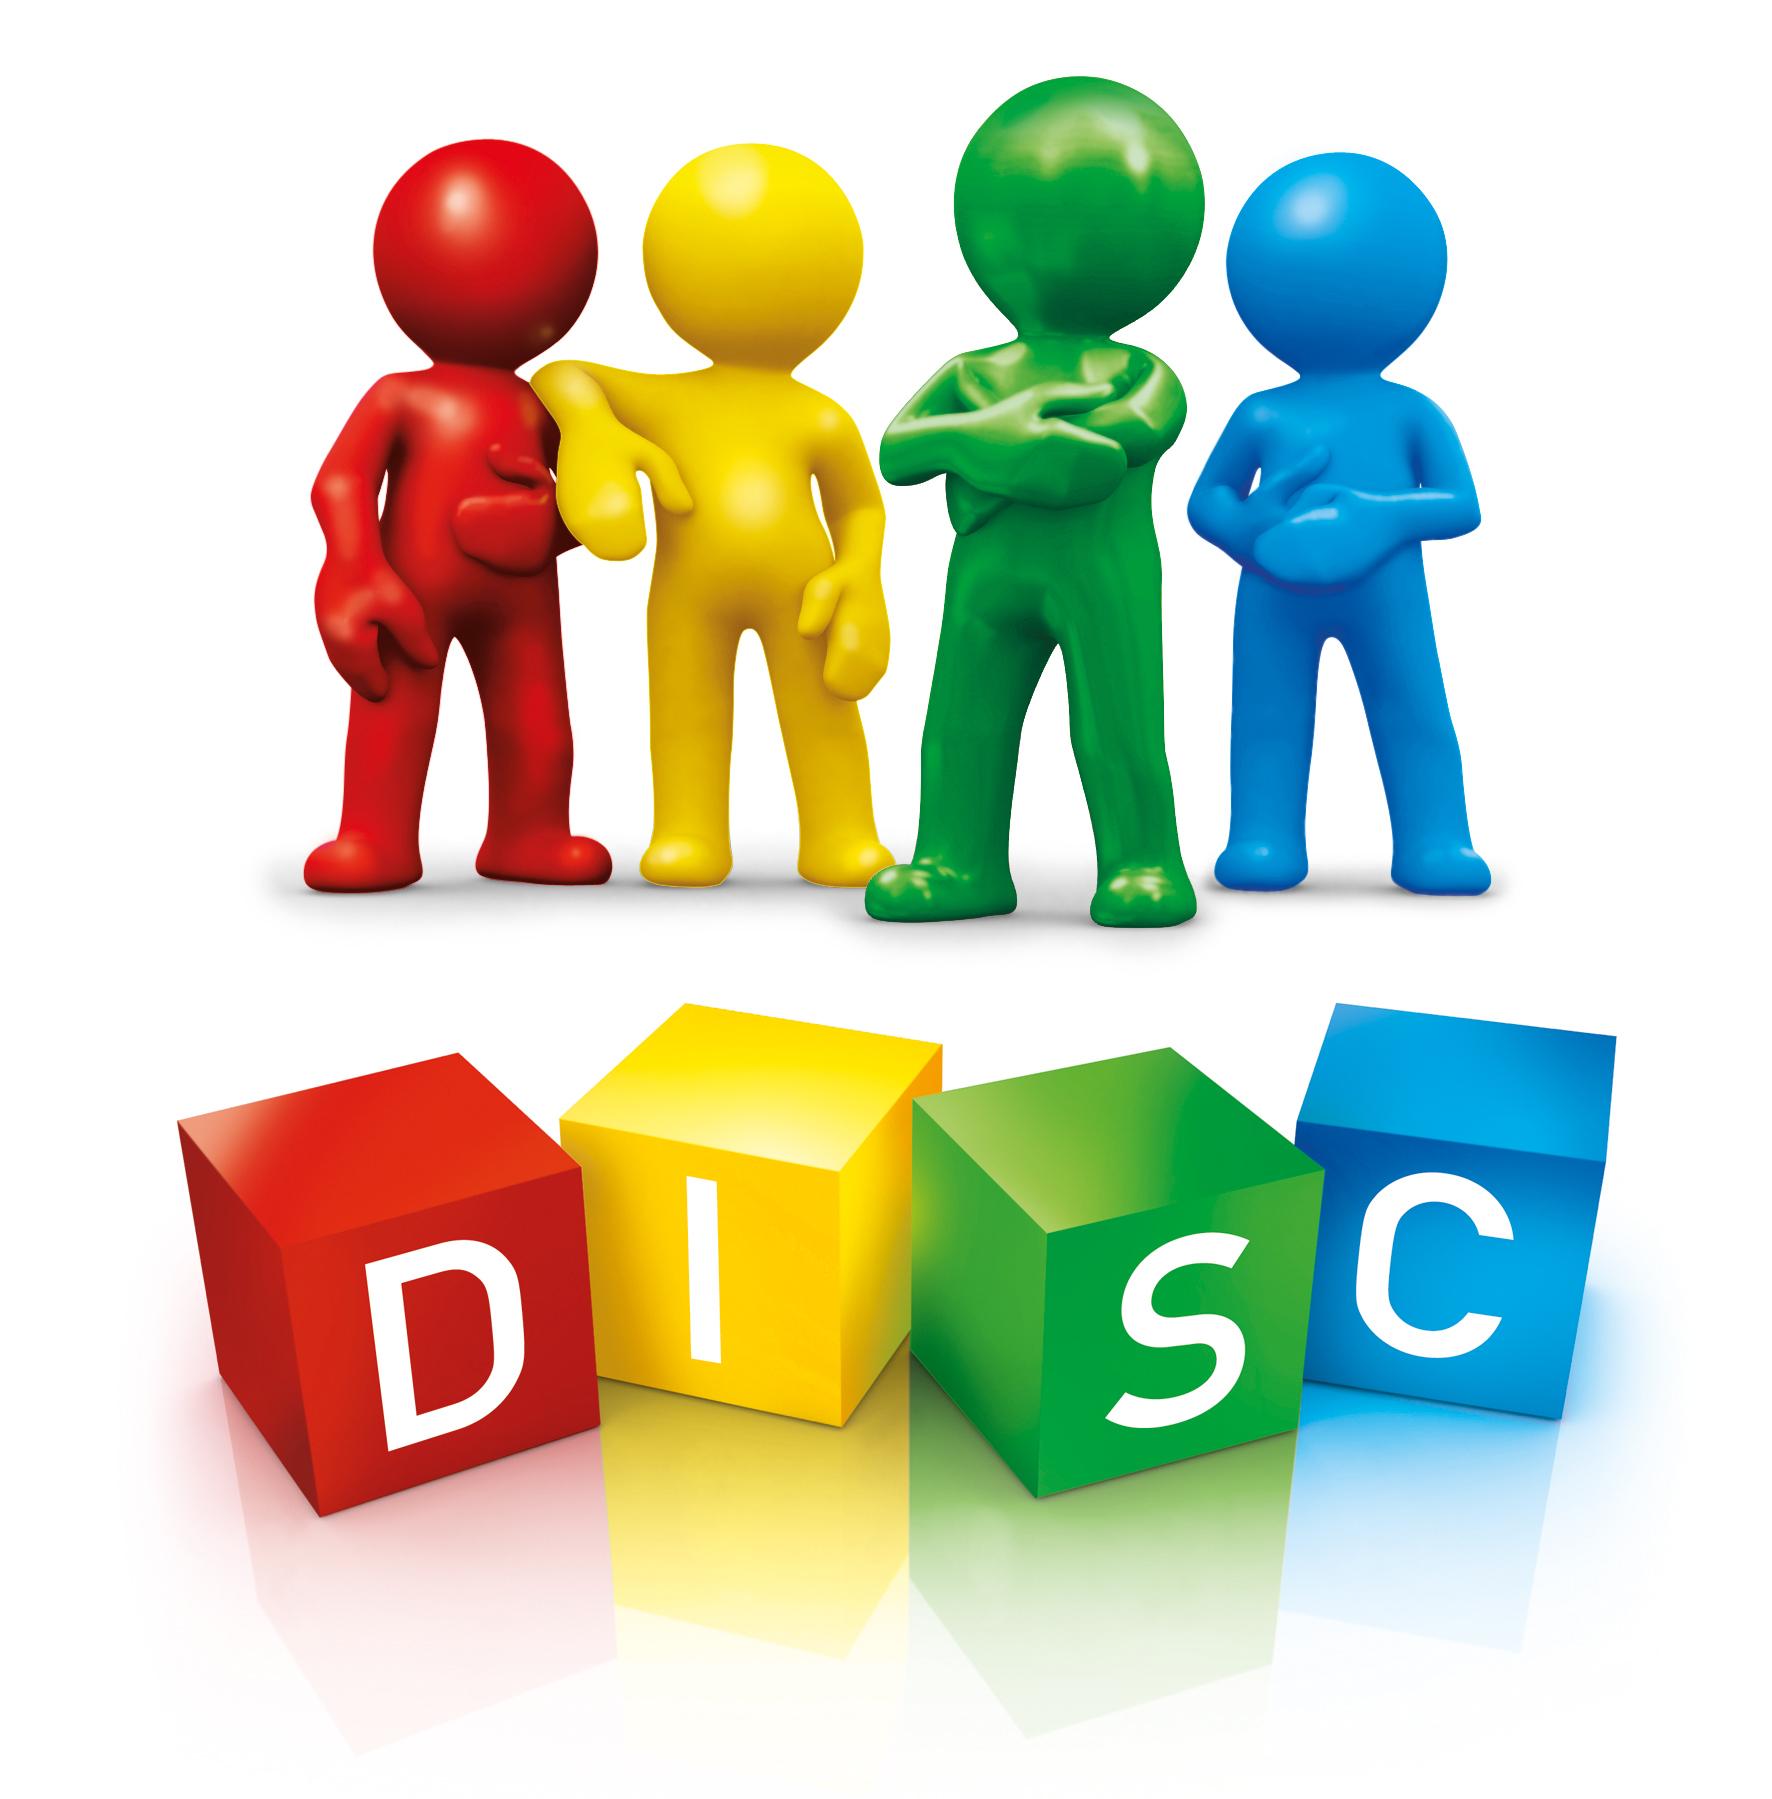 دیسک:متد رفتارشناسی